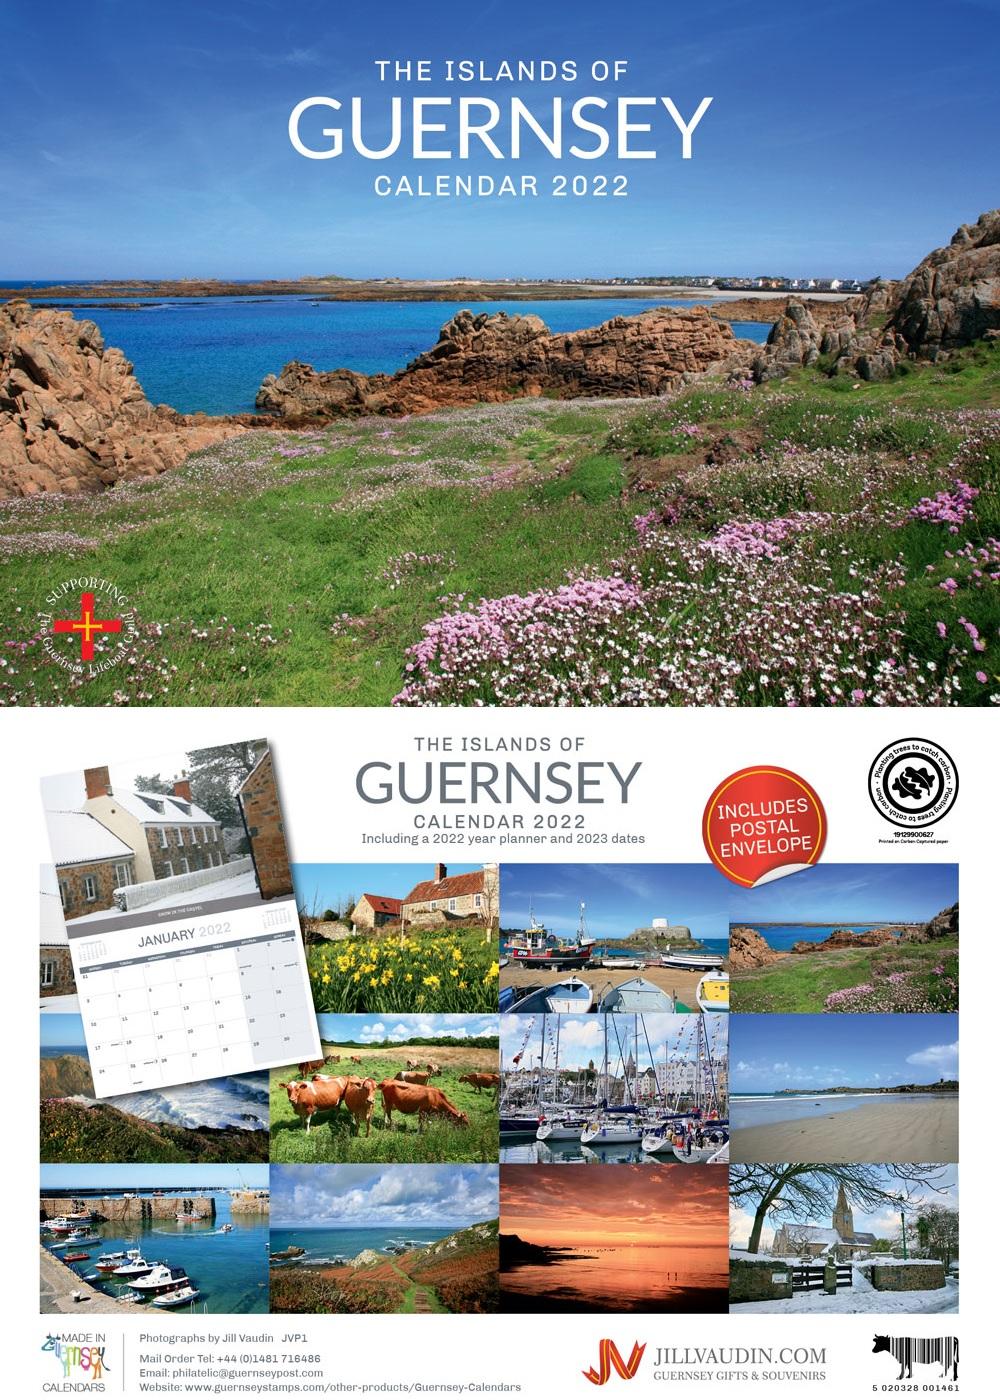 Guernsey A4 Calendar 2022